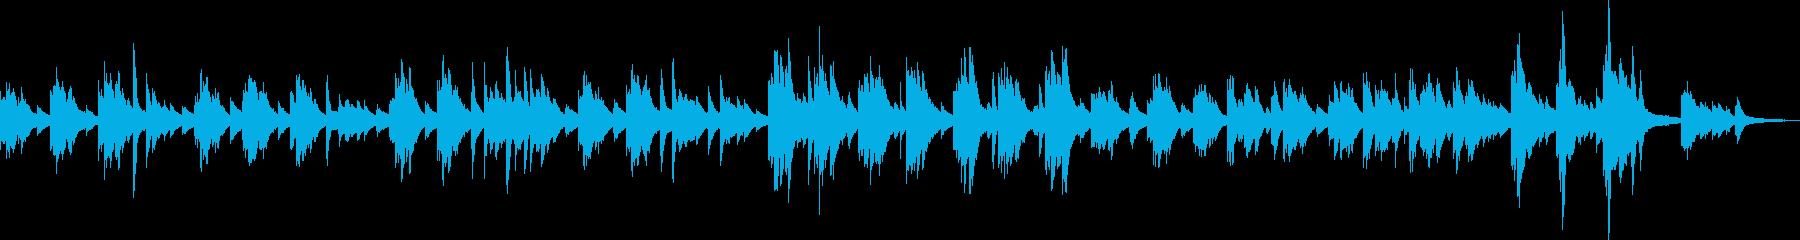 Piano piece of regret / confession's reproduced waveform